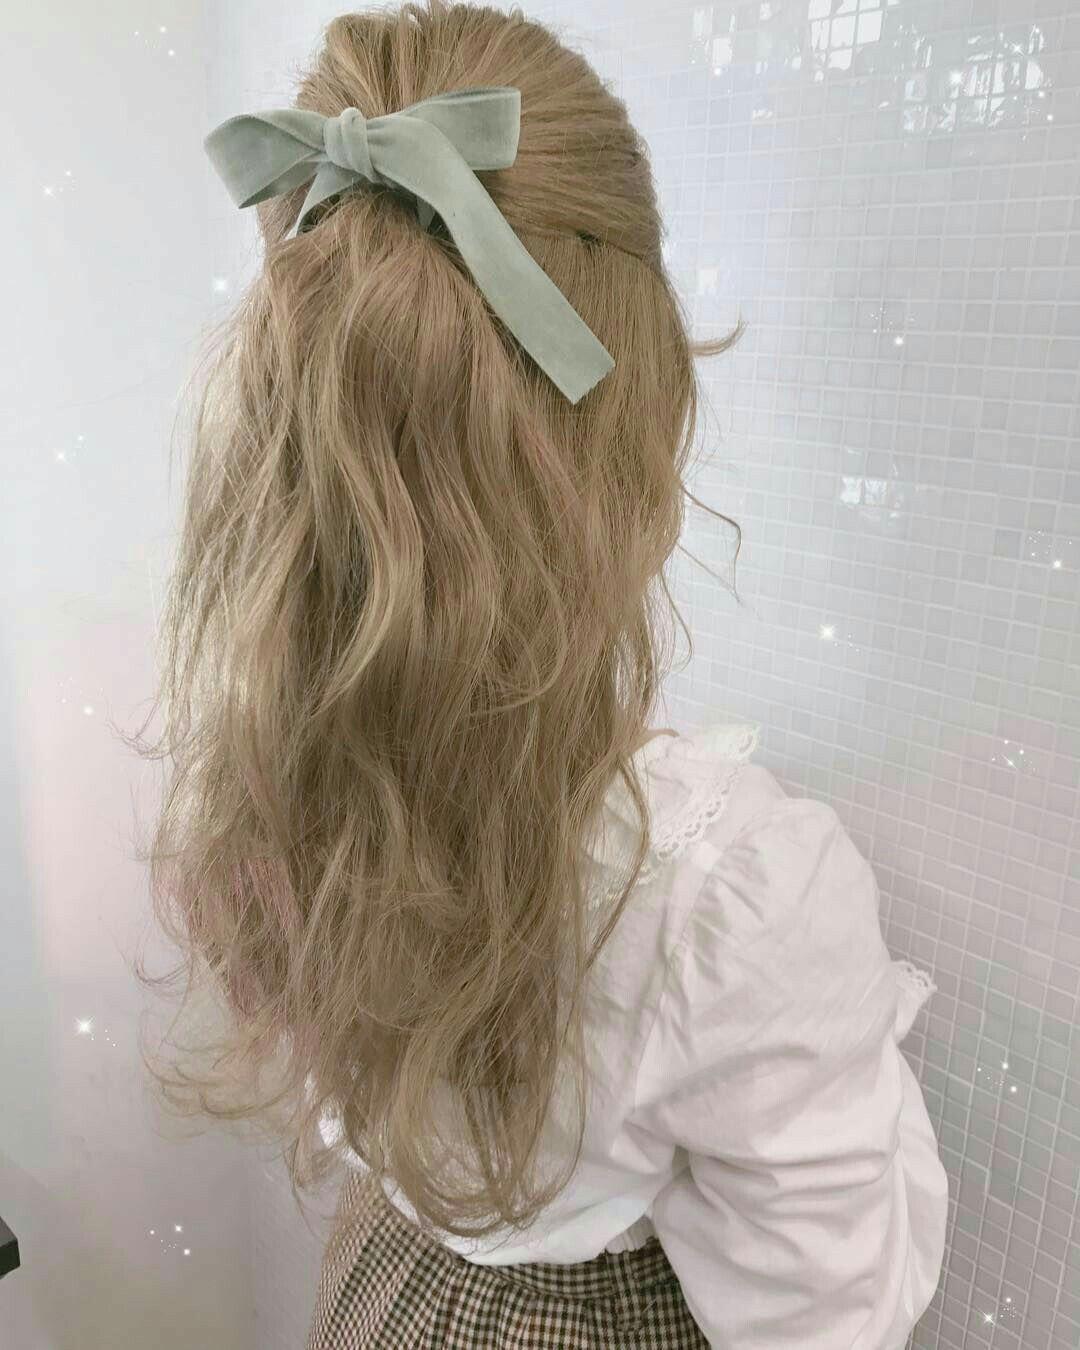 Pinterest Nemesis Fashion In 2019 Hair Styles Long